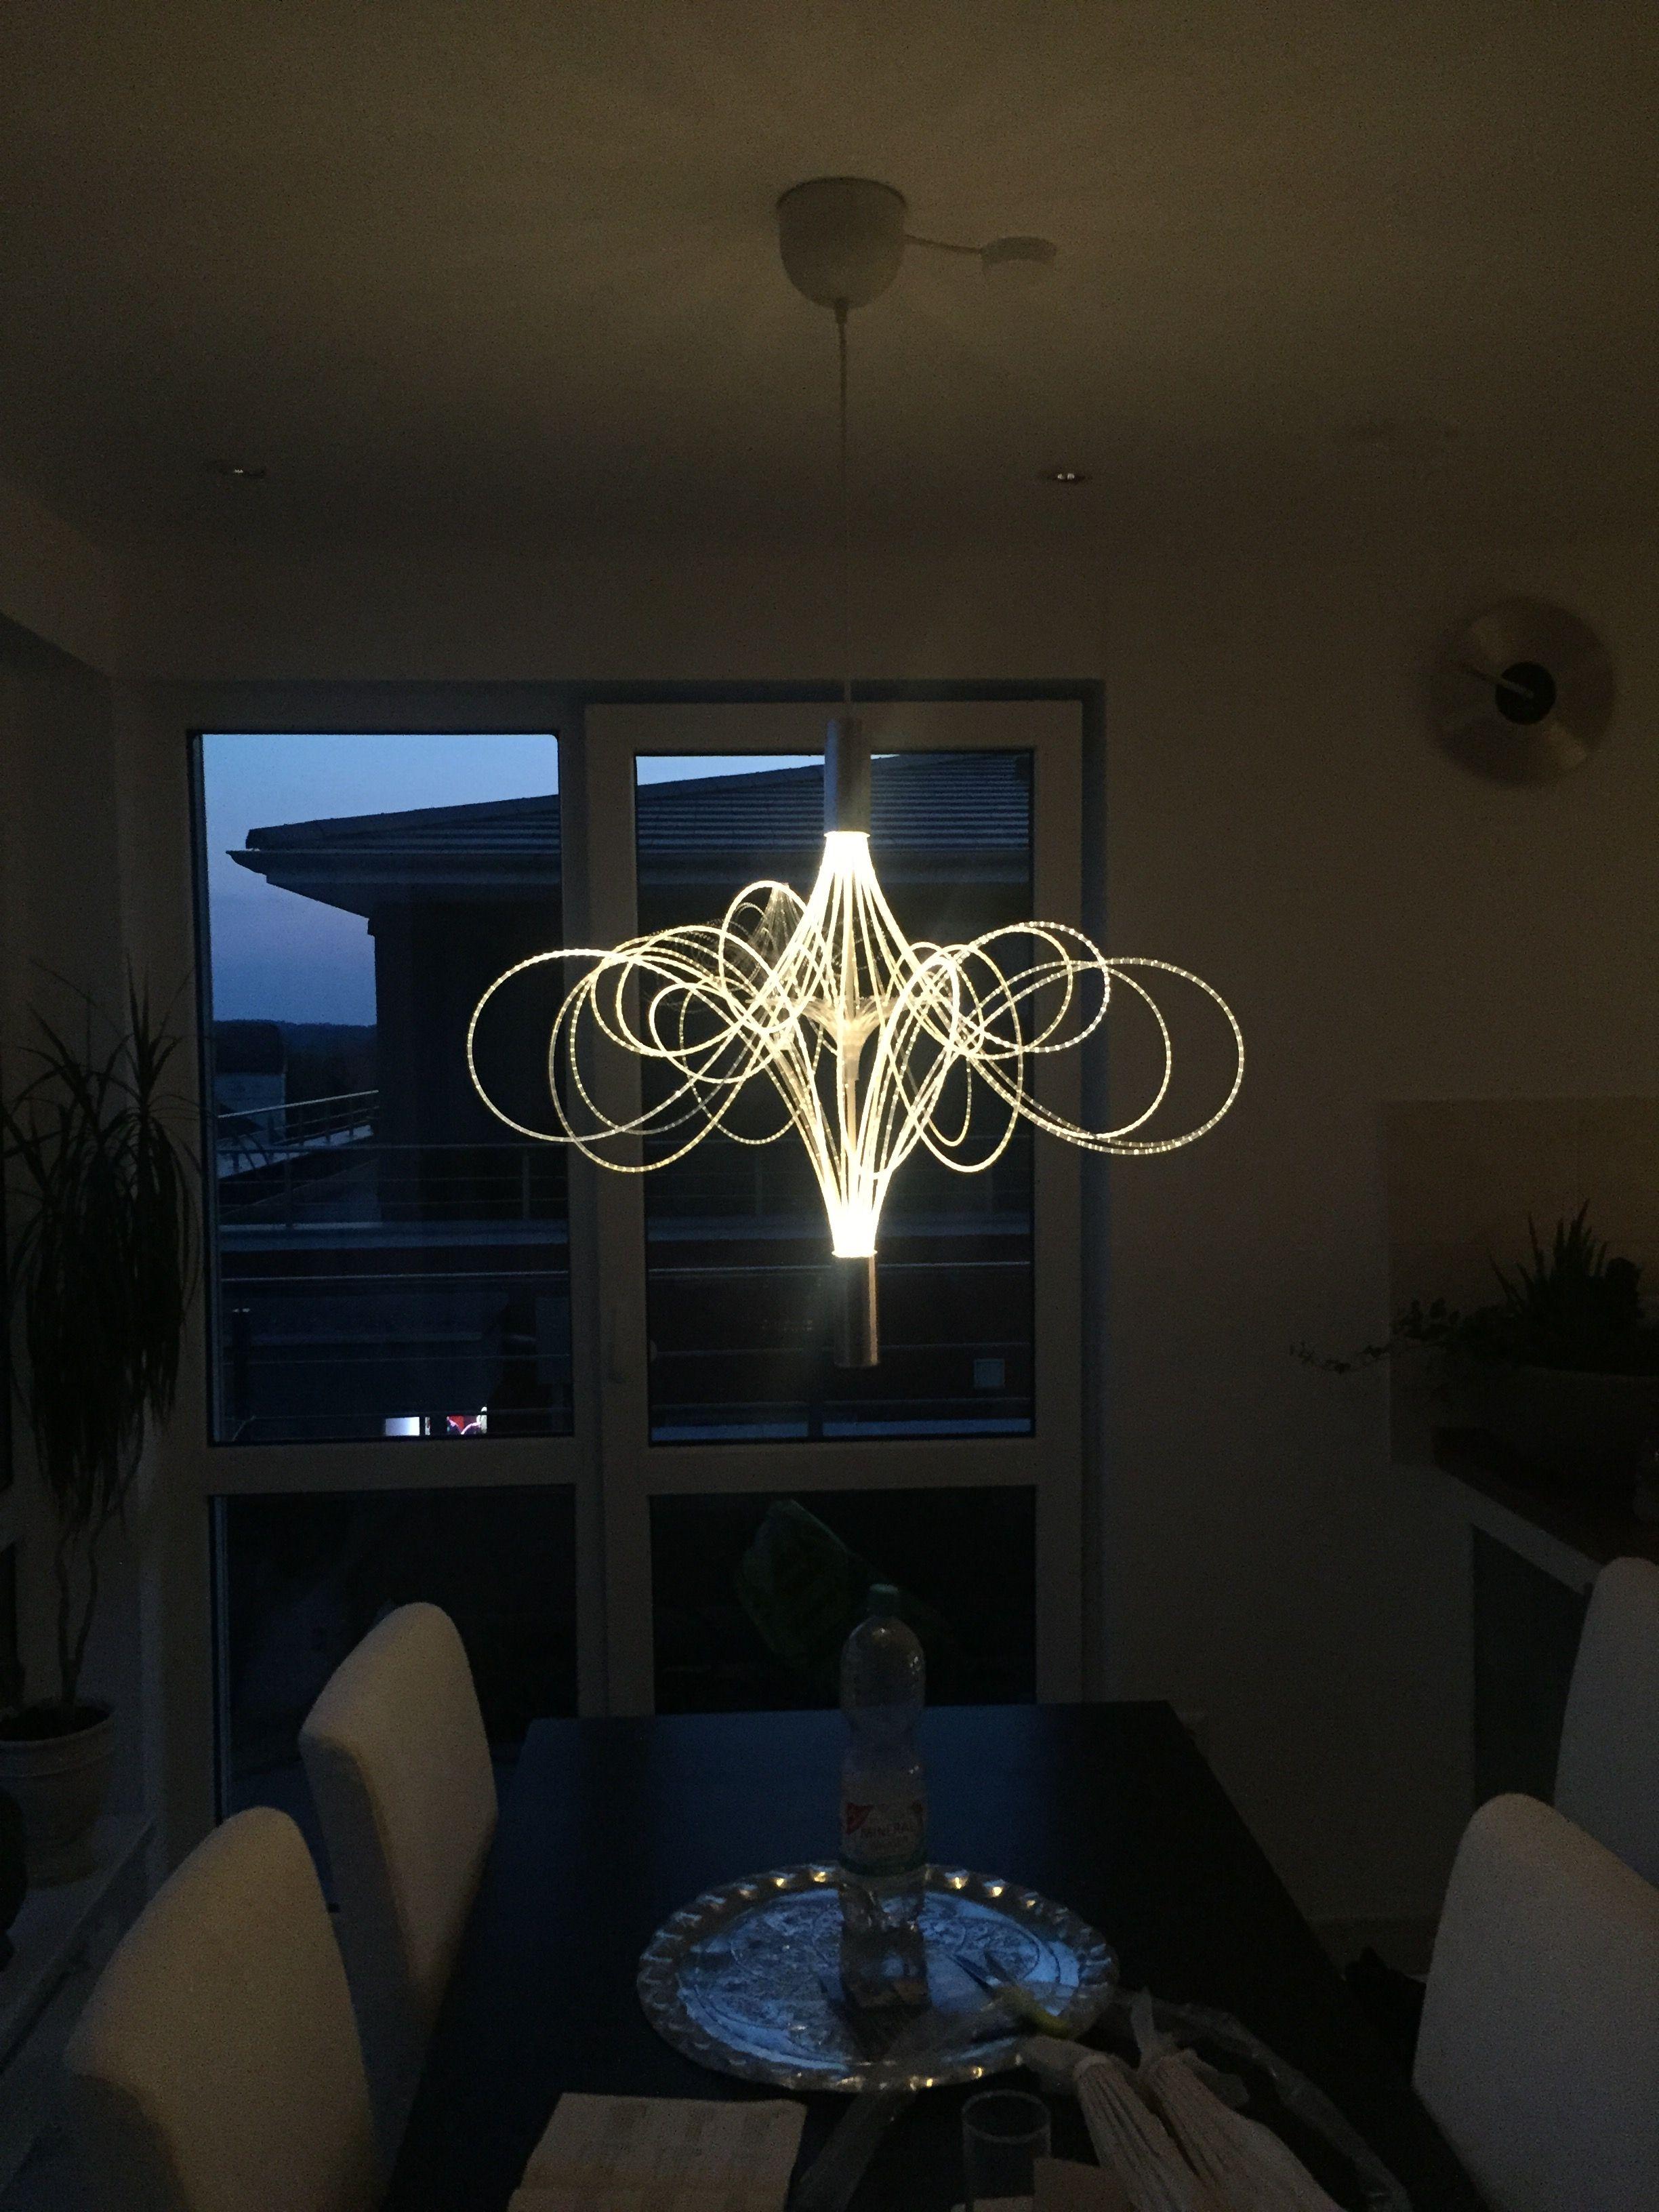 lvsbyn kronleuchter von ikea ein absoluter hingucker restart pinterest living room. Black Bedroom Furniture Sets. Home Design Ideas